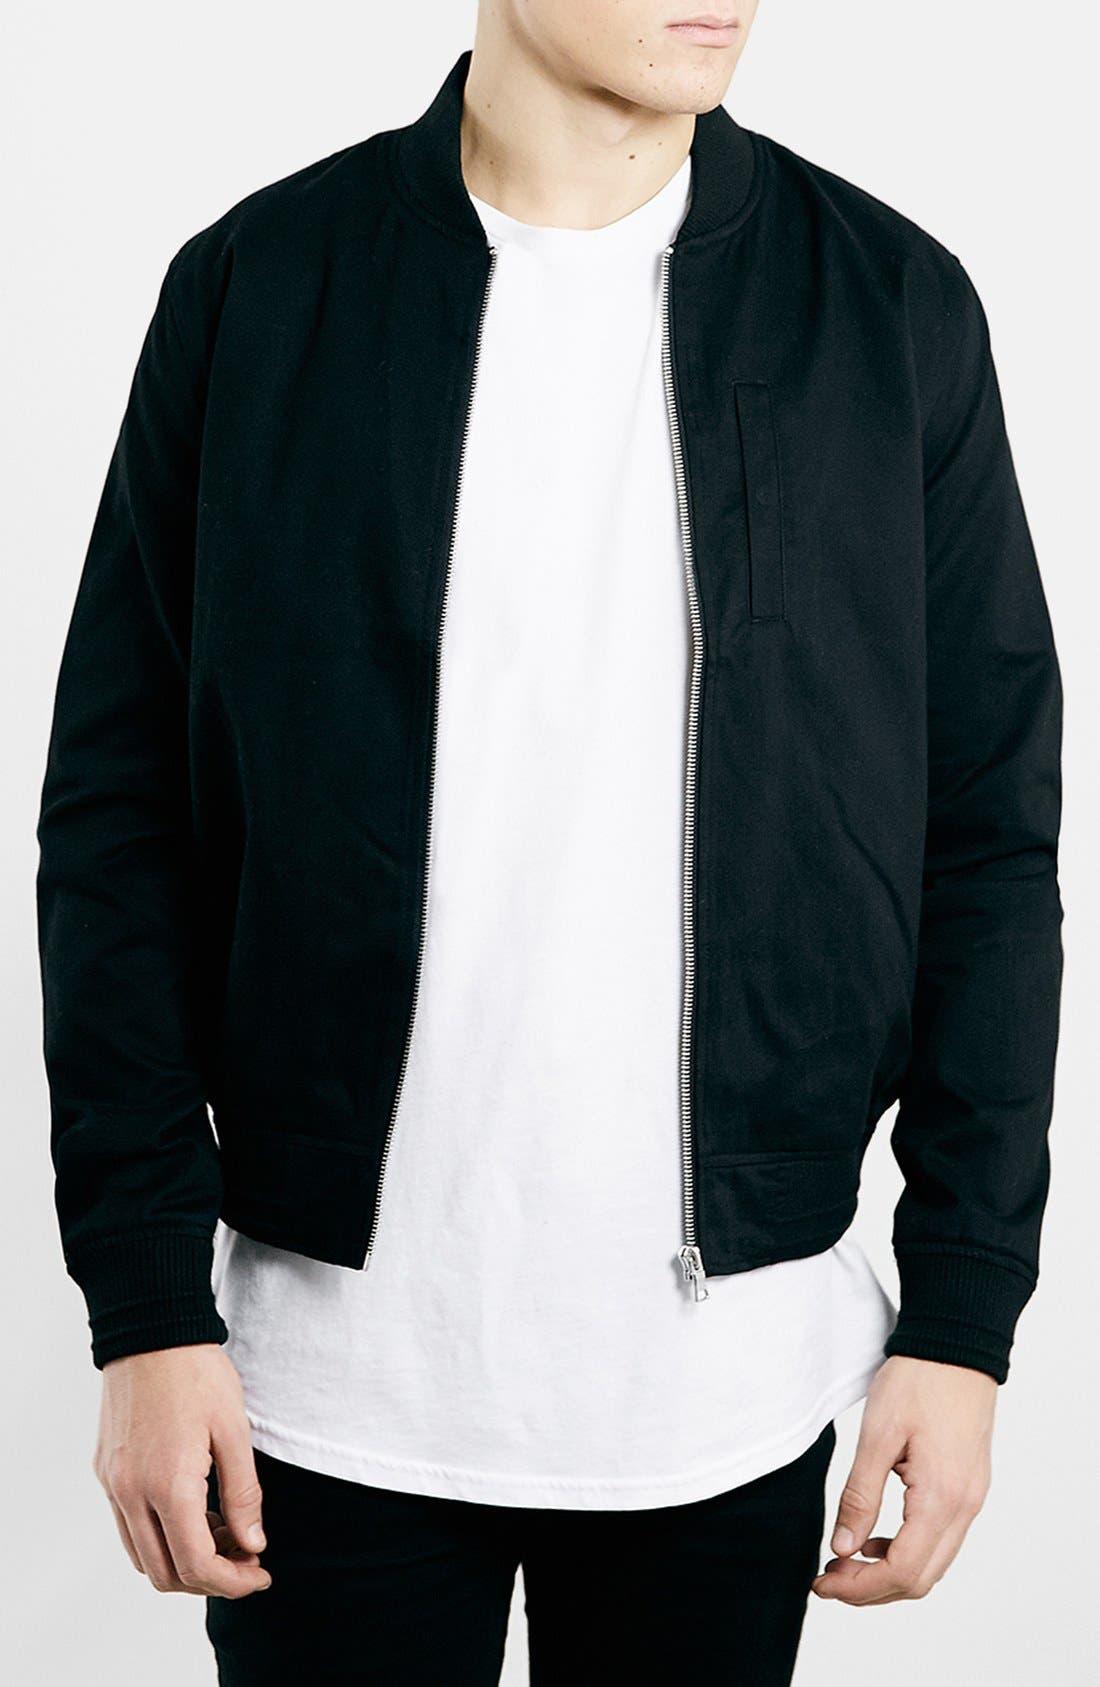 Topman Black Cotton Bomber Jacket | Nordstrom